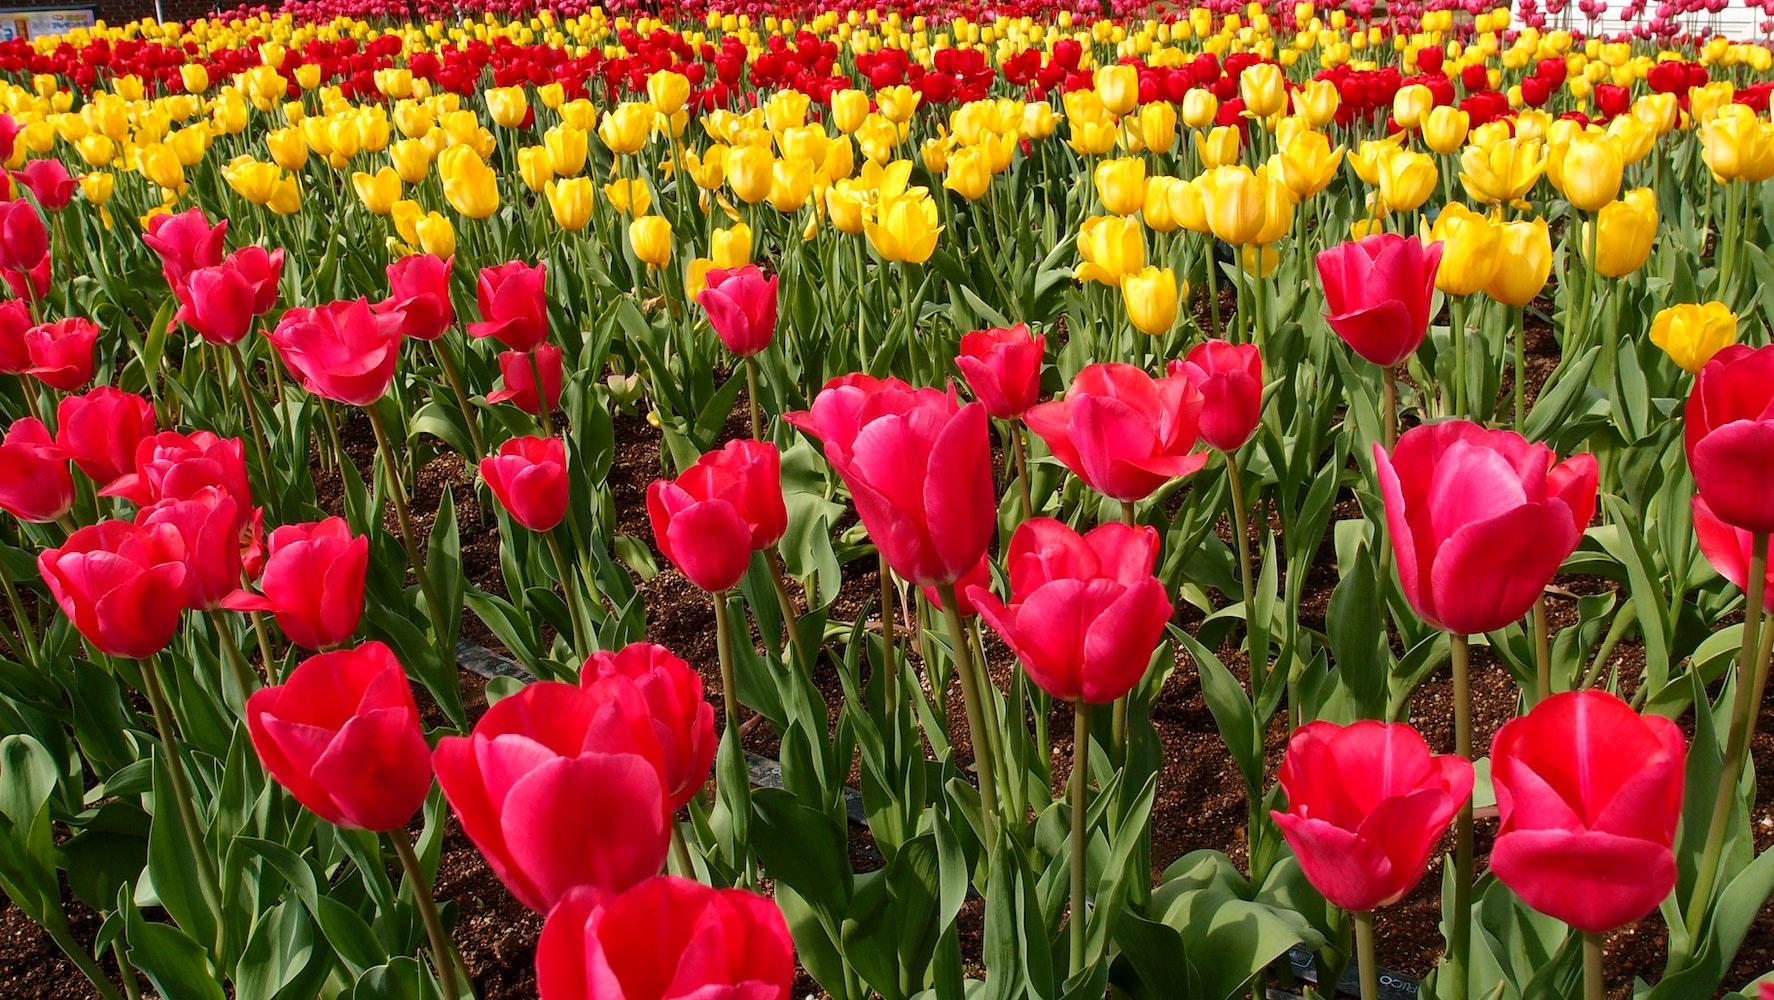 flower wallpaper · pexels · free stock photos